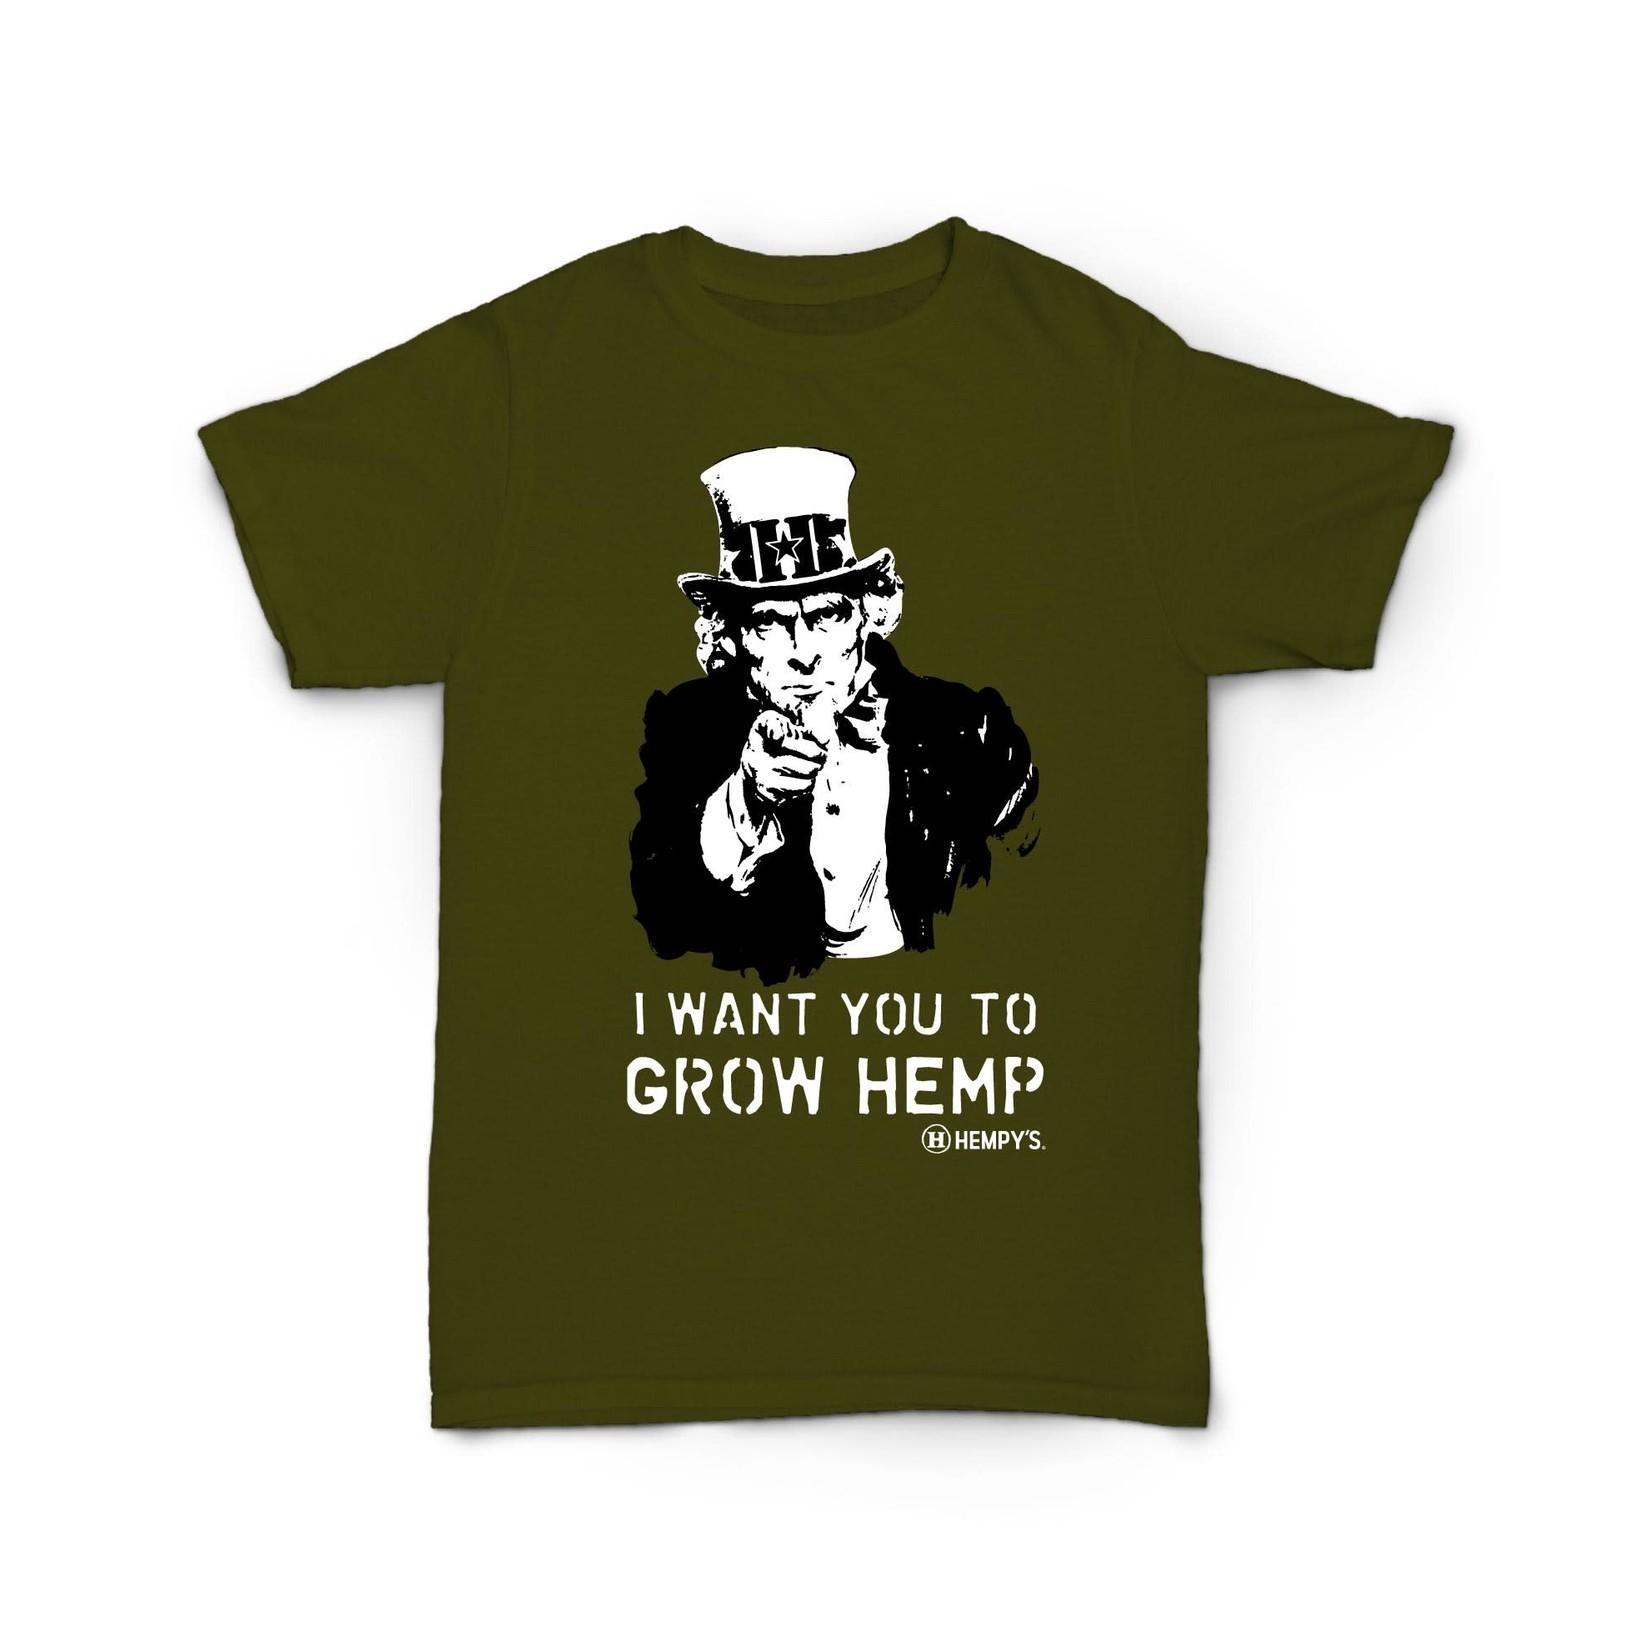 Hempy's Hemp T Shirt Uncle Sam Green